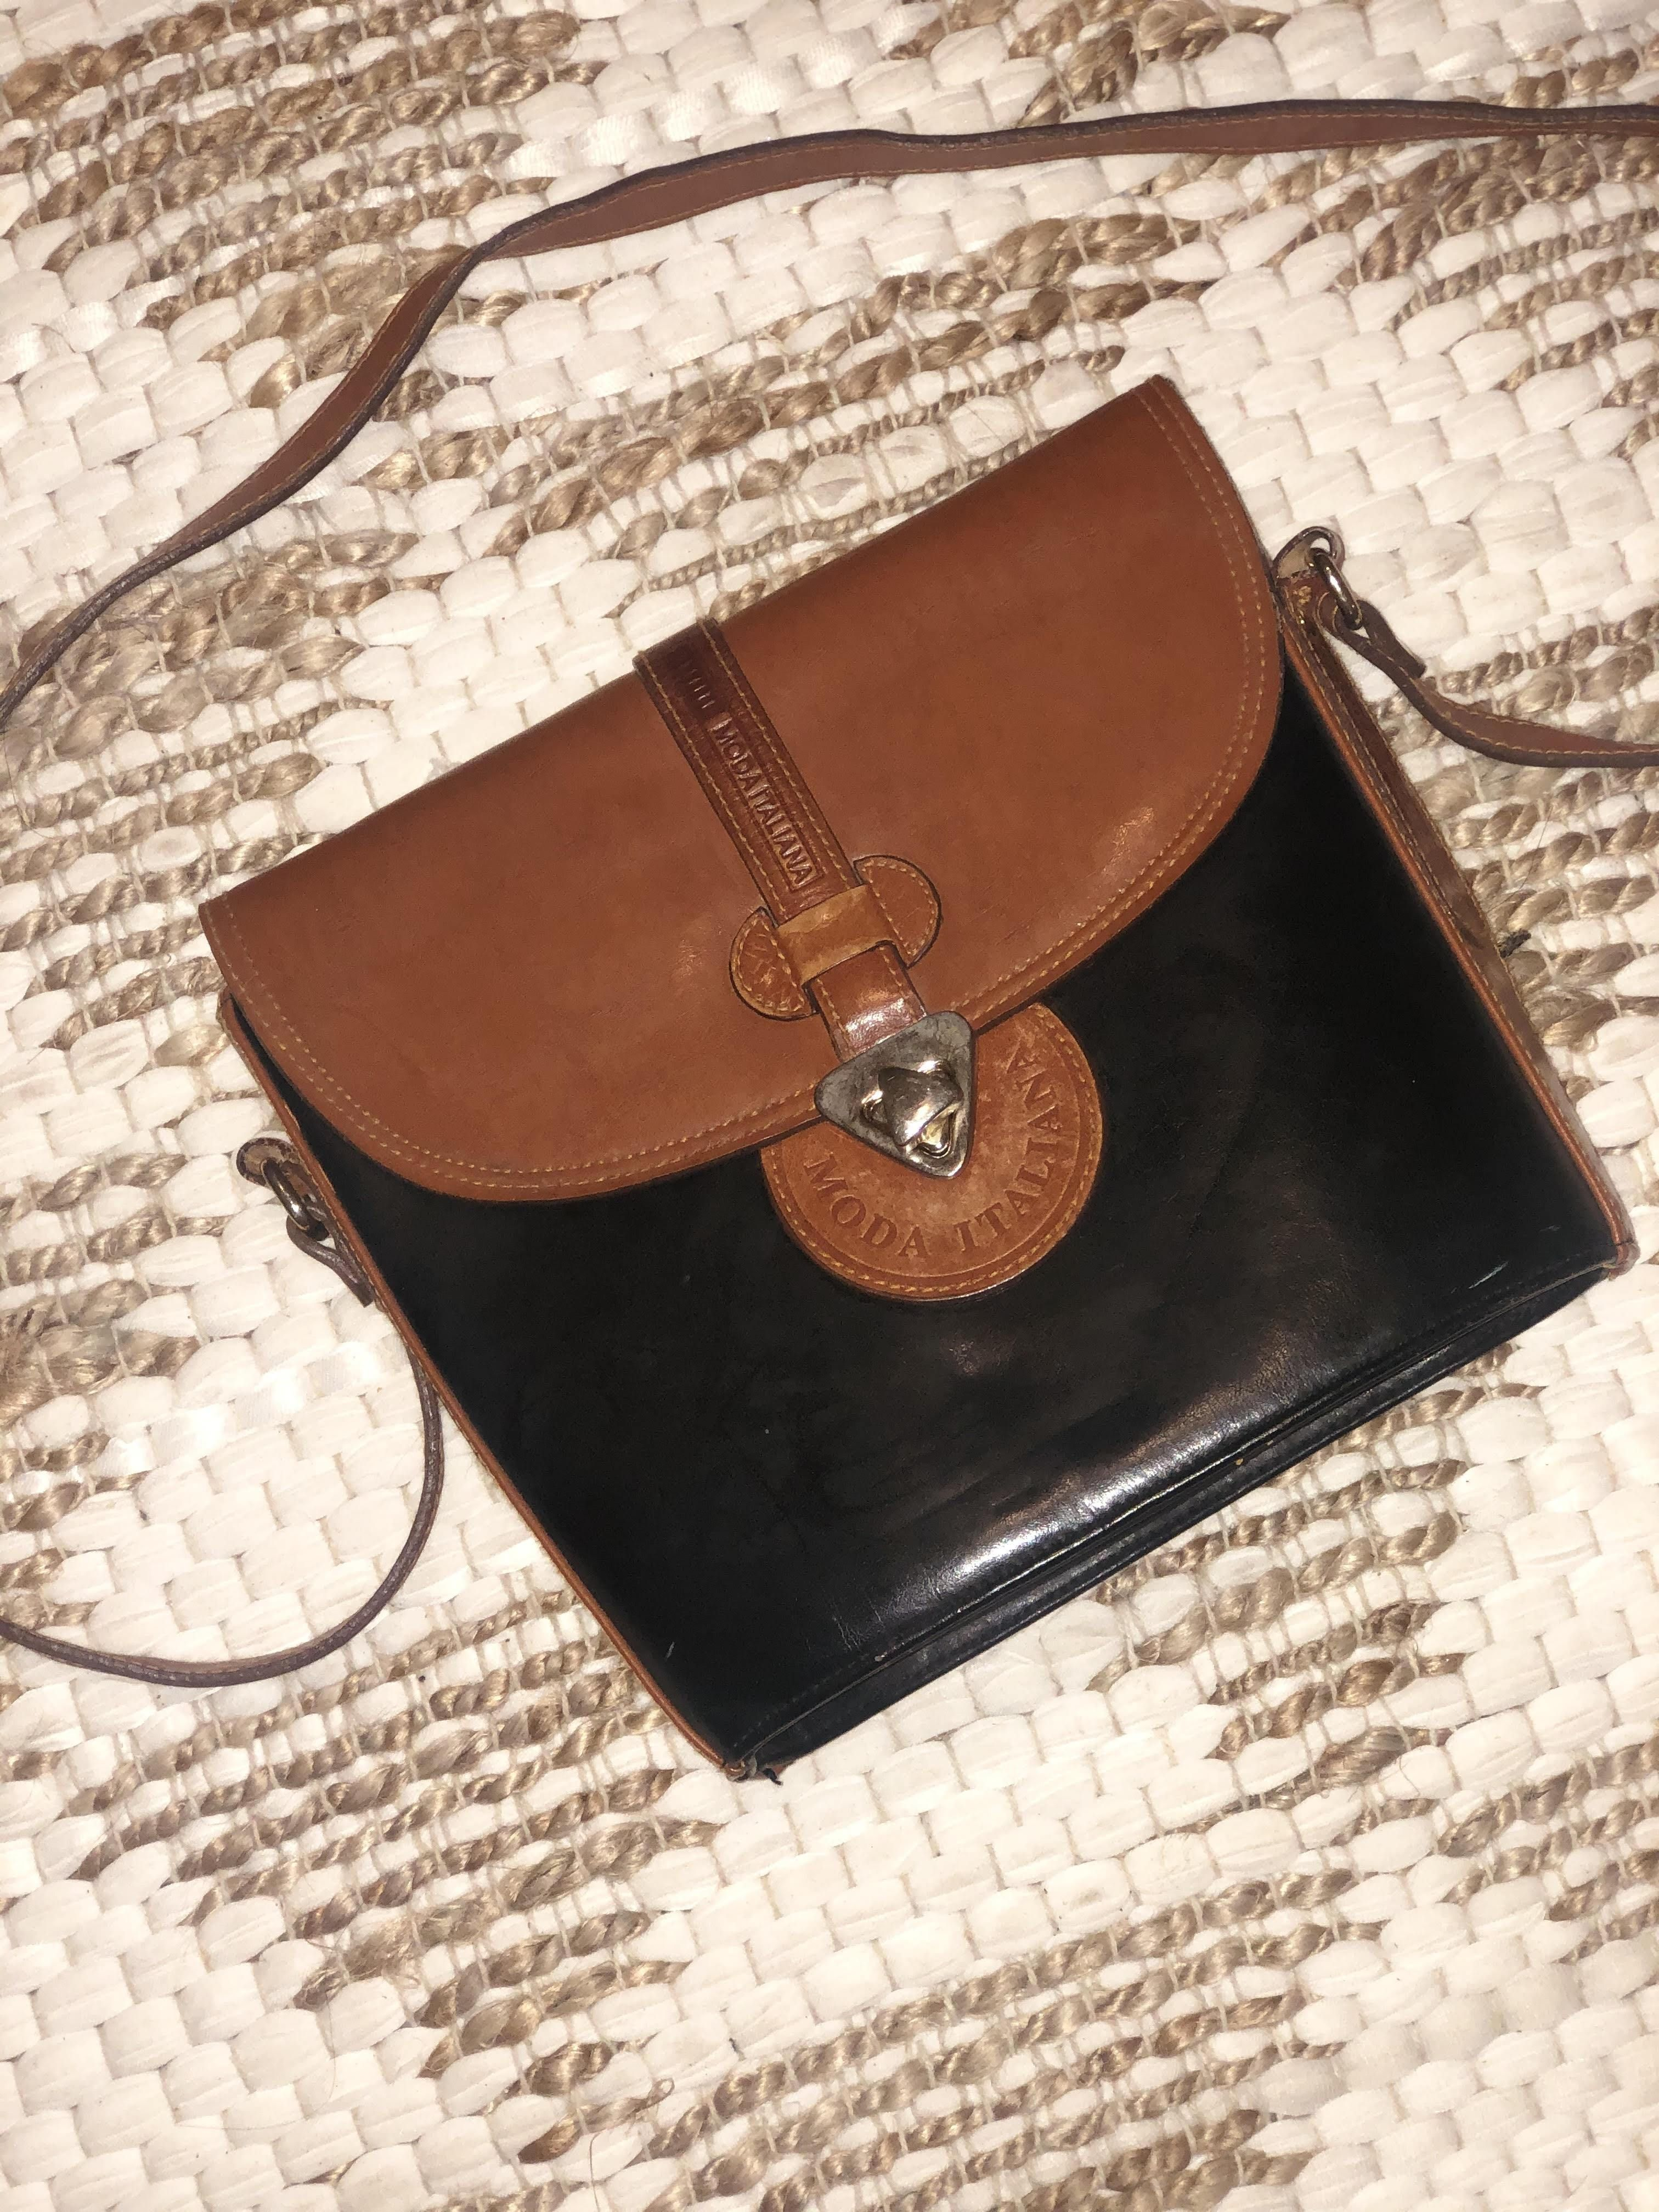 Moda Italia Bucket Purse shoulder bag Med. leather